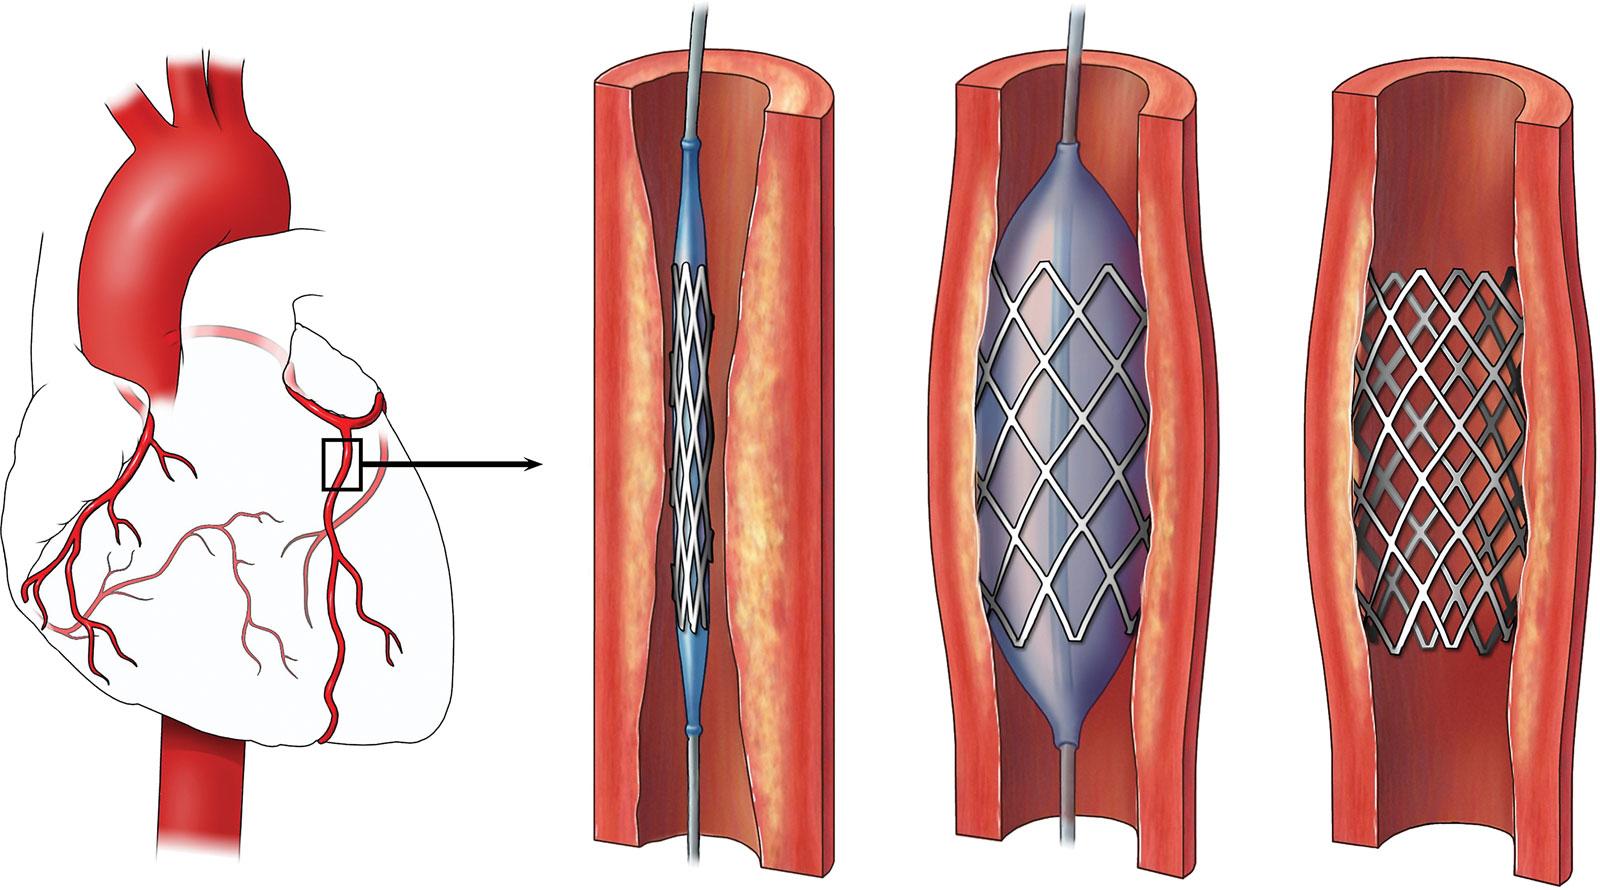 лечение инфаркта миокарда, баллонная ангиопластика и стентирование коронарной артерии